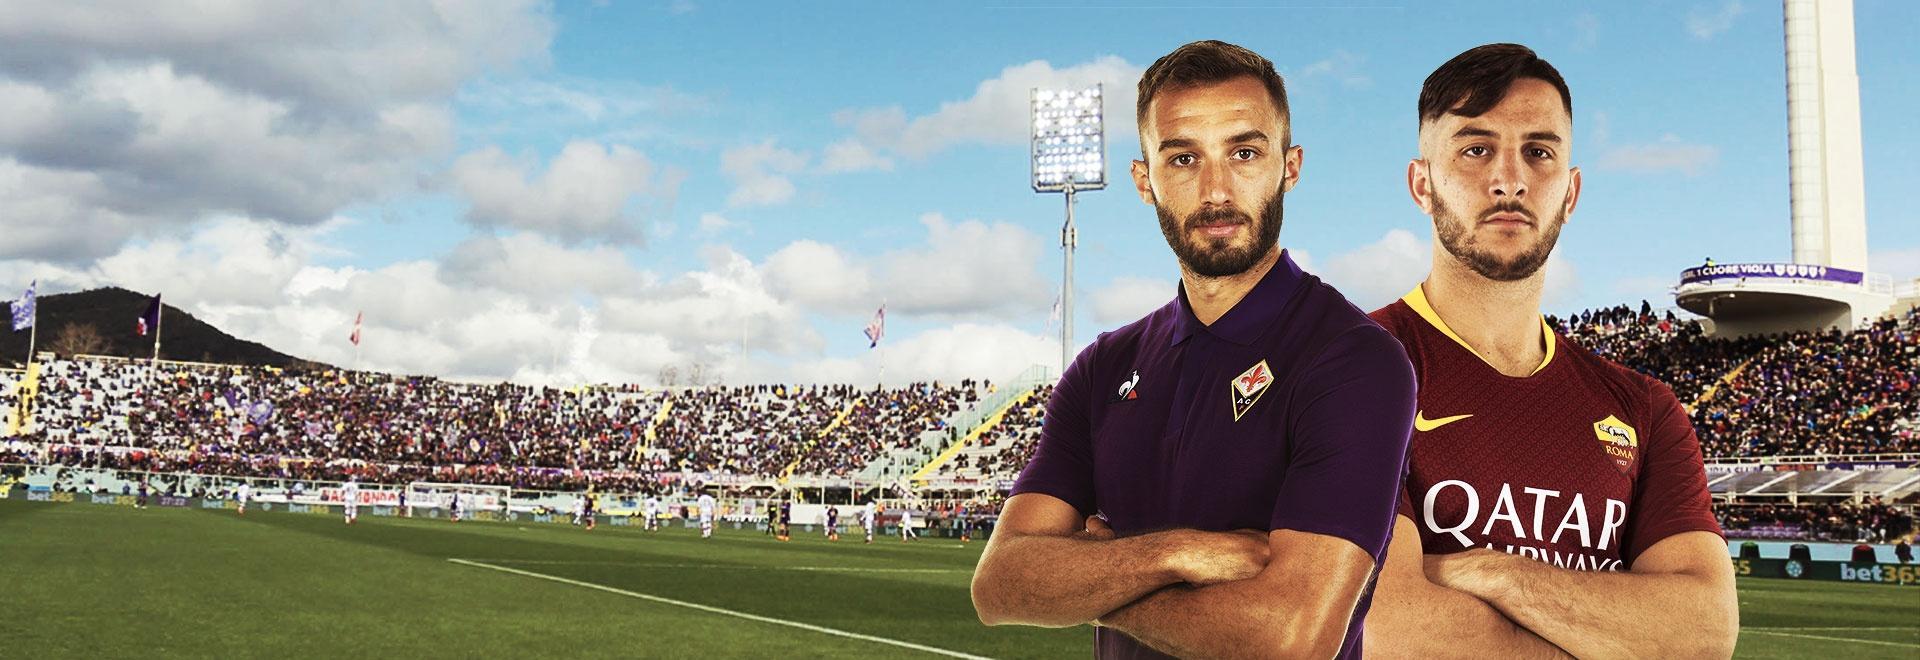 Fiorentina - Roma. 11a g.